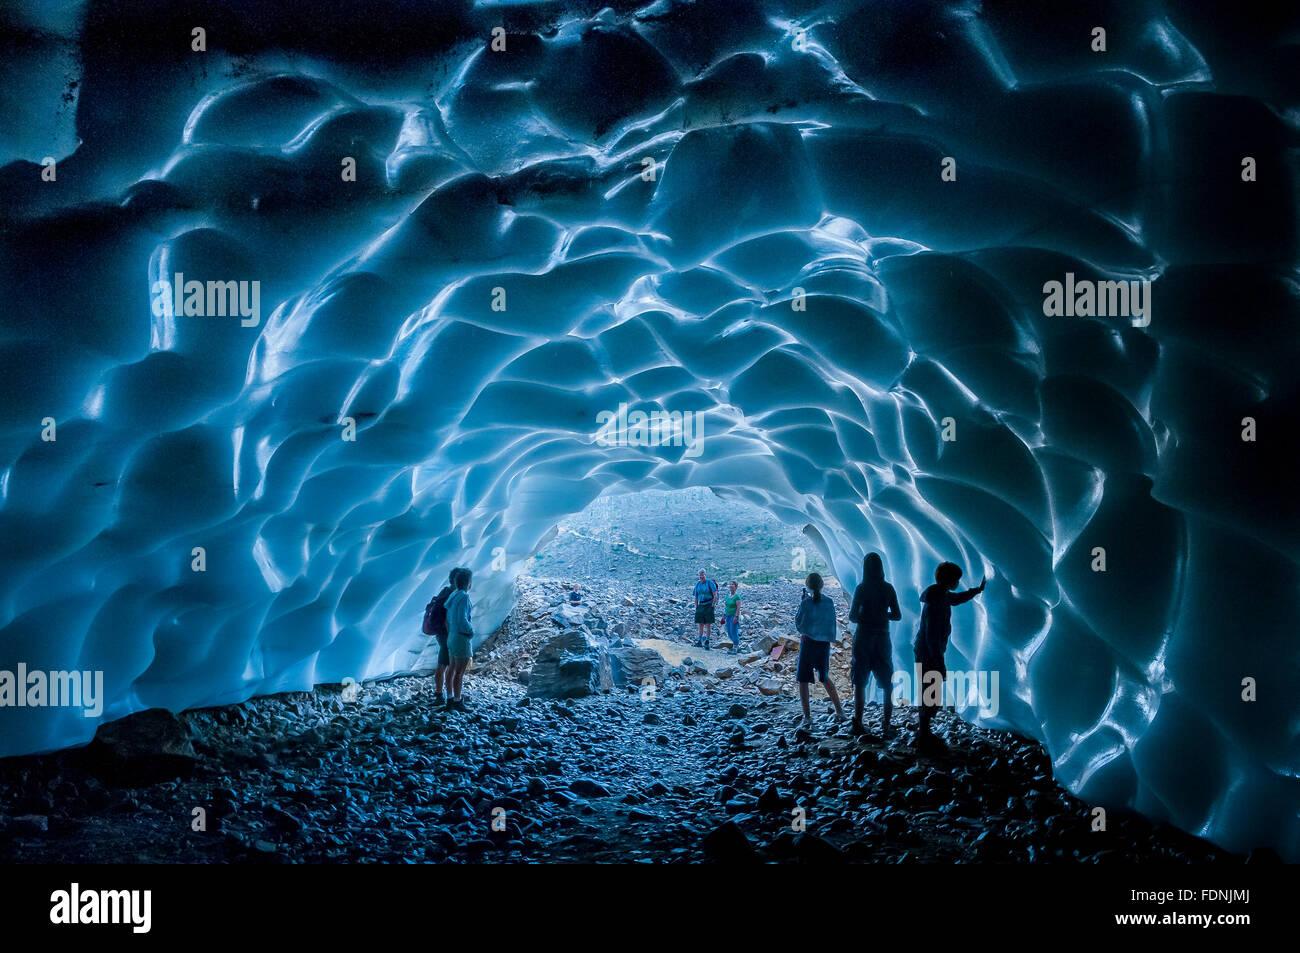 People explore ice cave in Cavell Glacier, Jasper National Park, Alberta, Canada - Stock Image